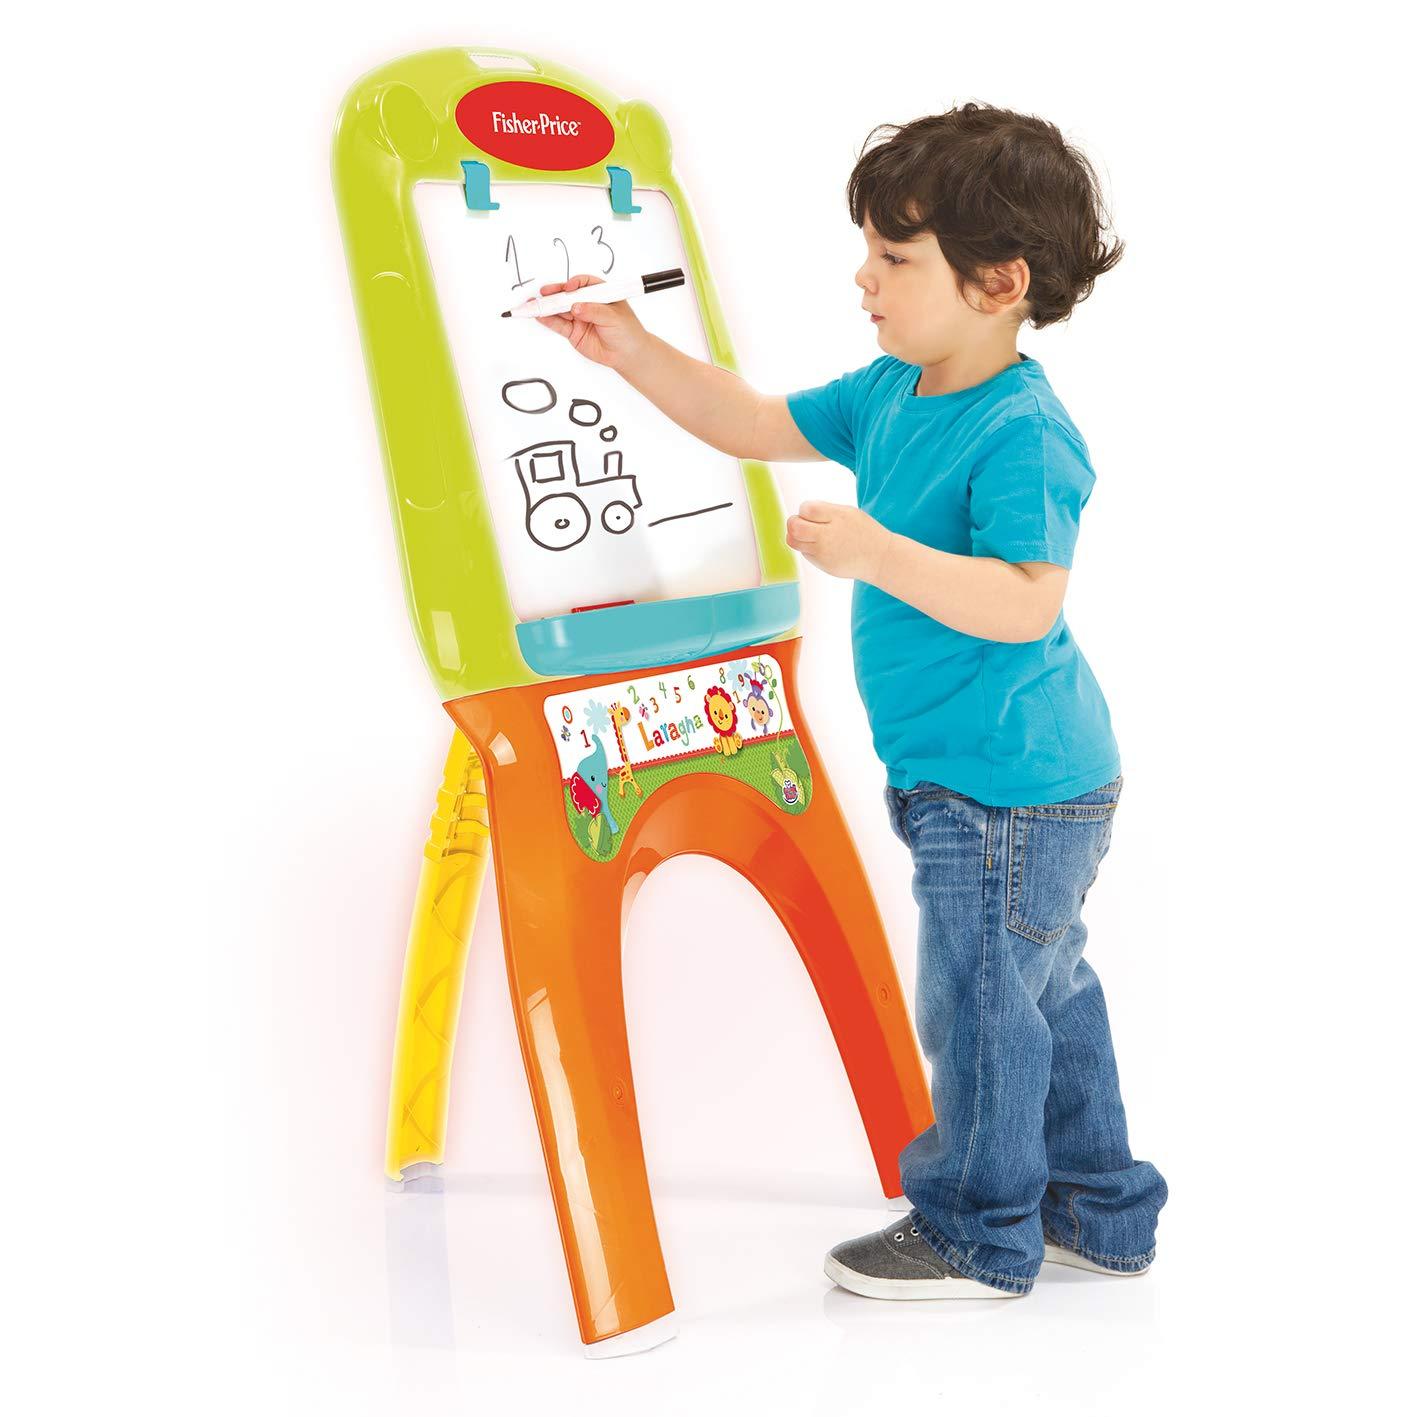 Amazon.com: Grandi Giochi gg01811 - Pizarra de pescado: Toys ...